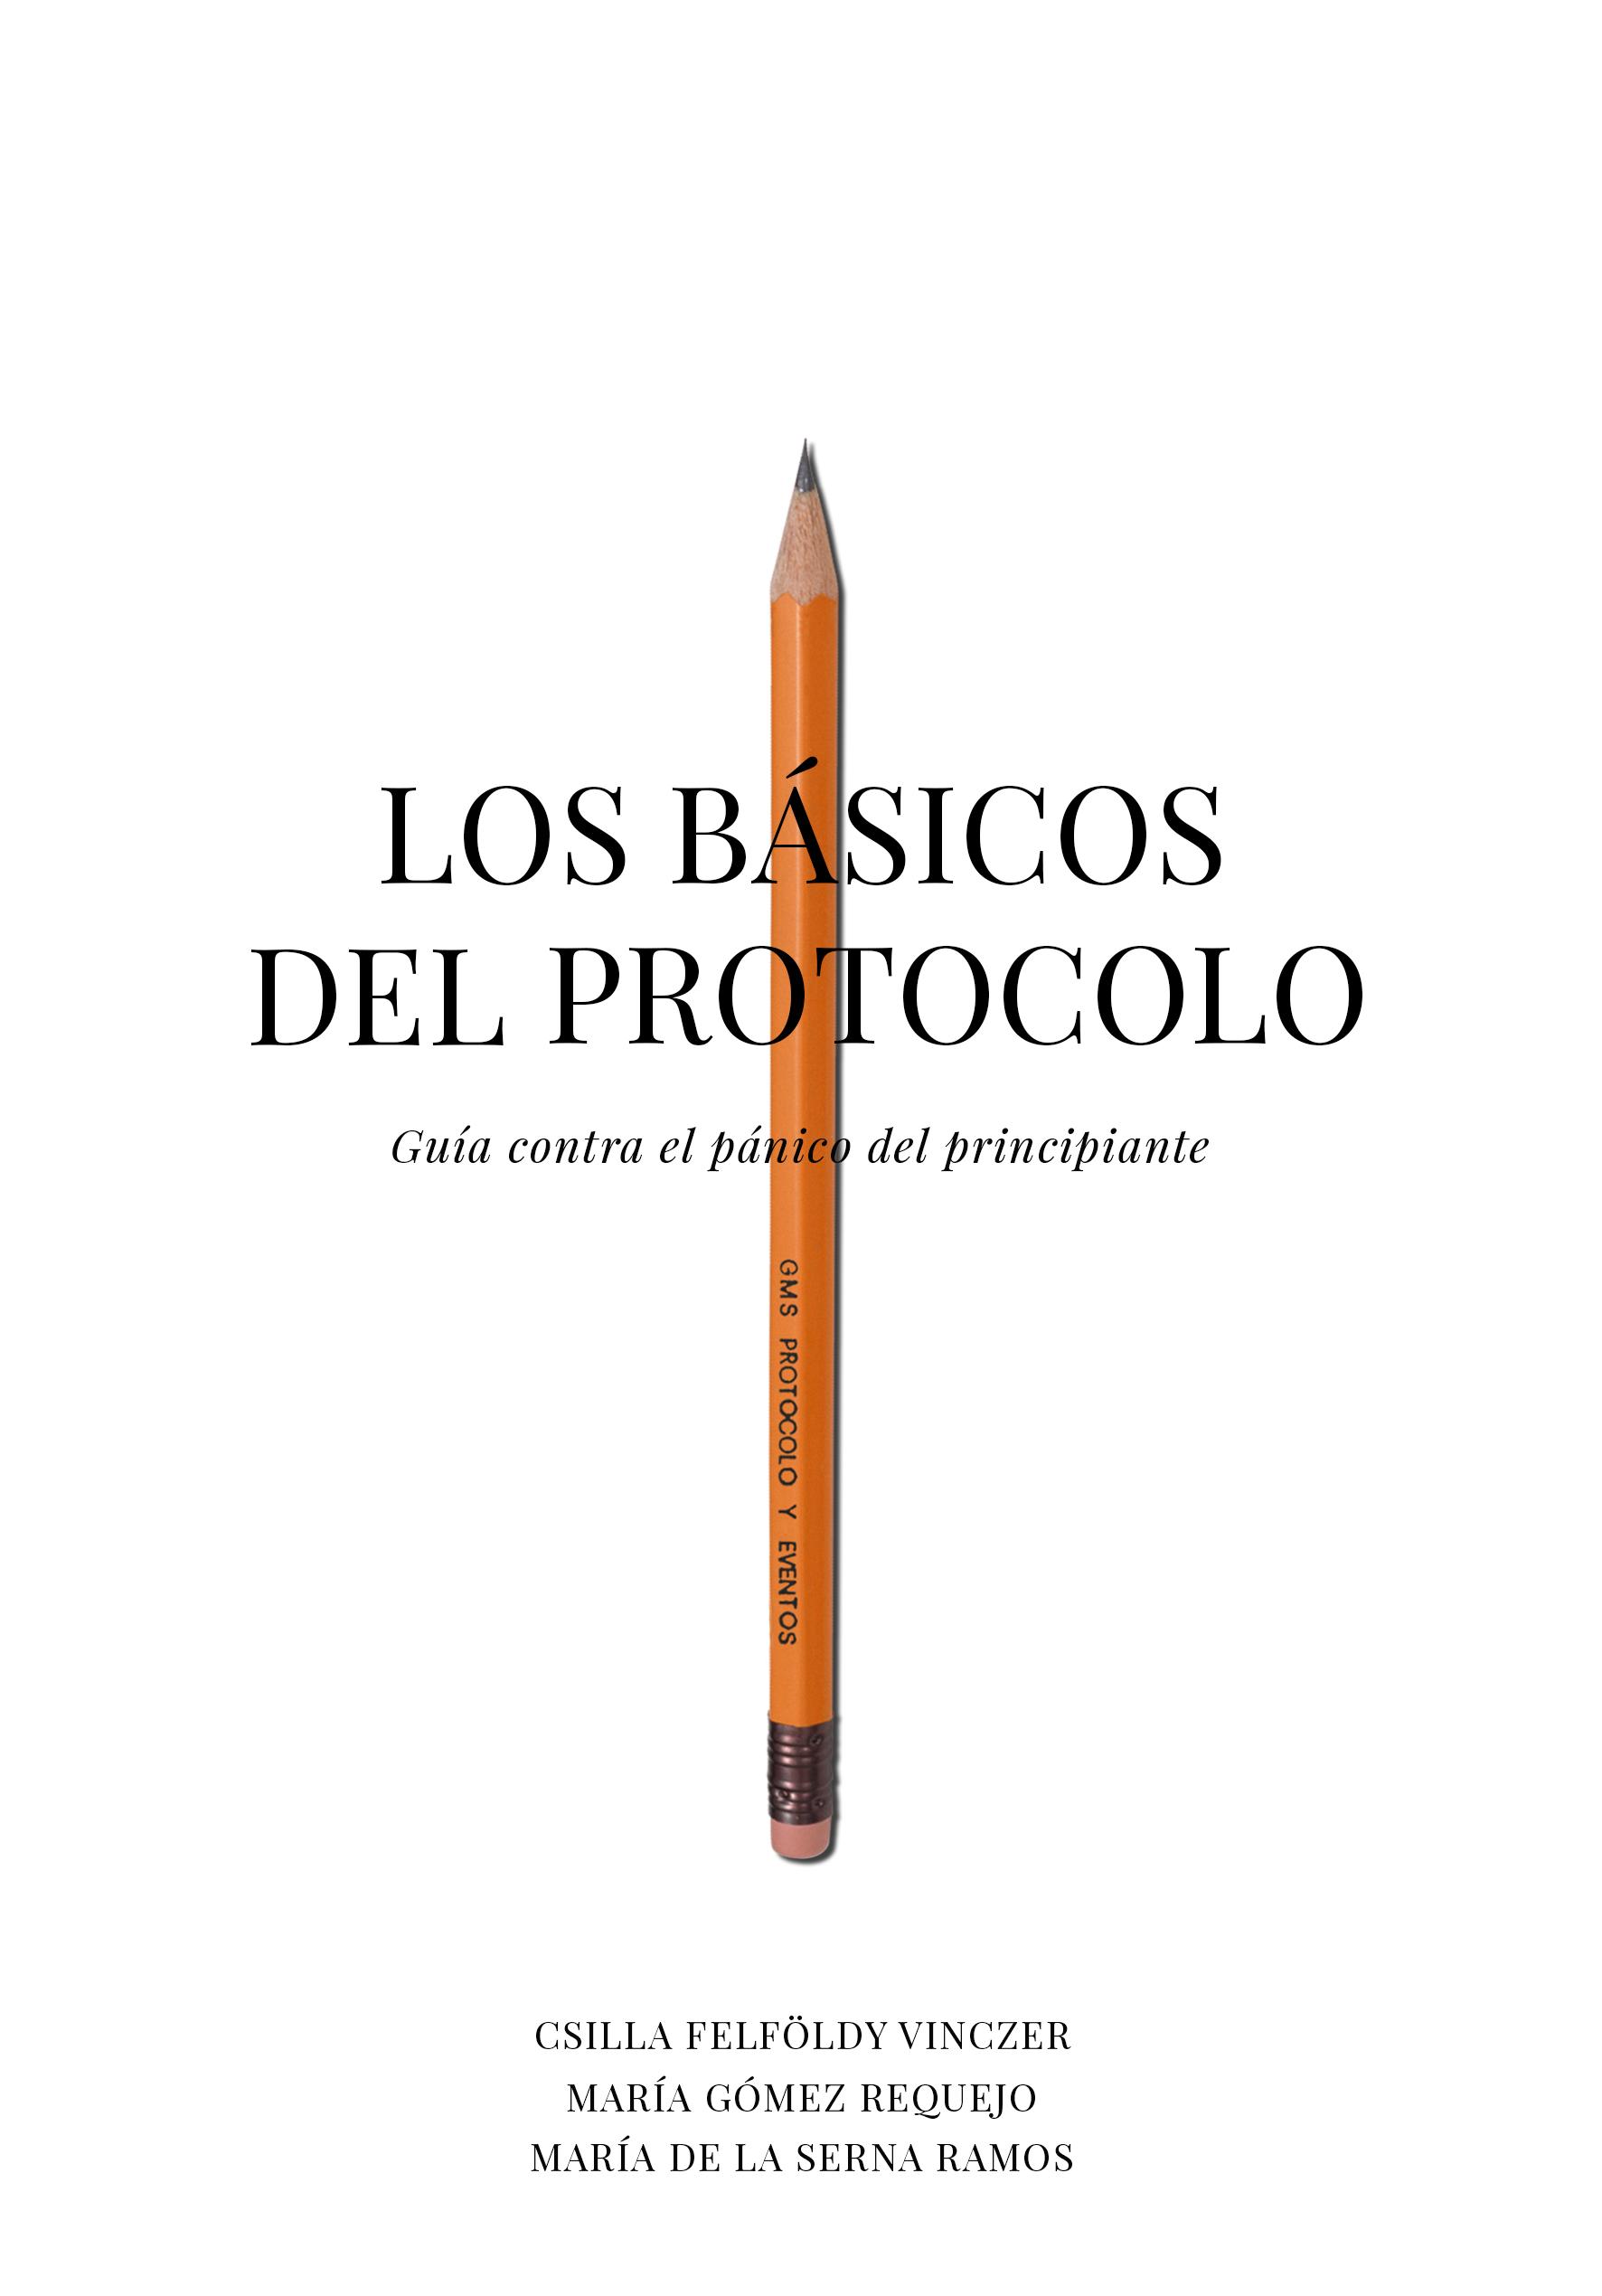 Libro de protocolo